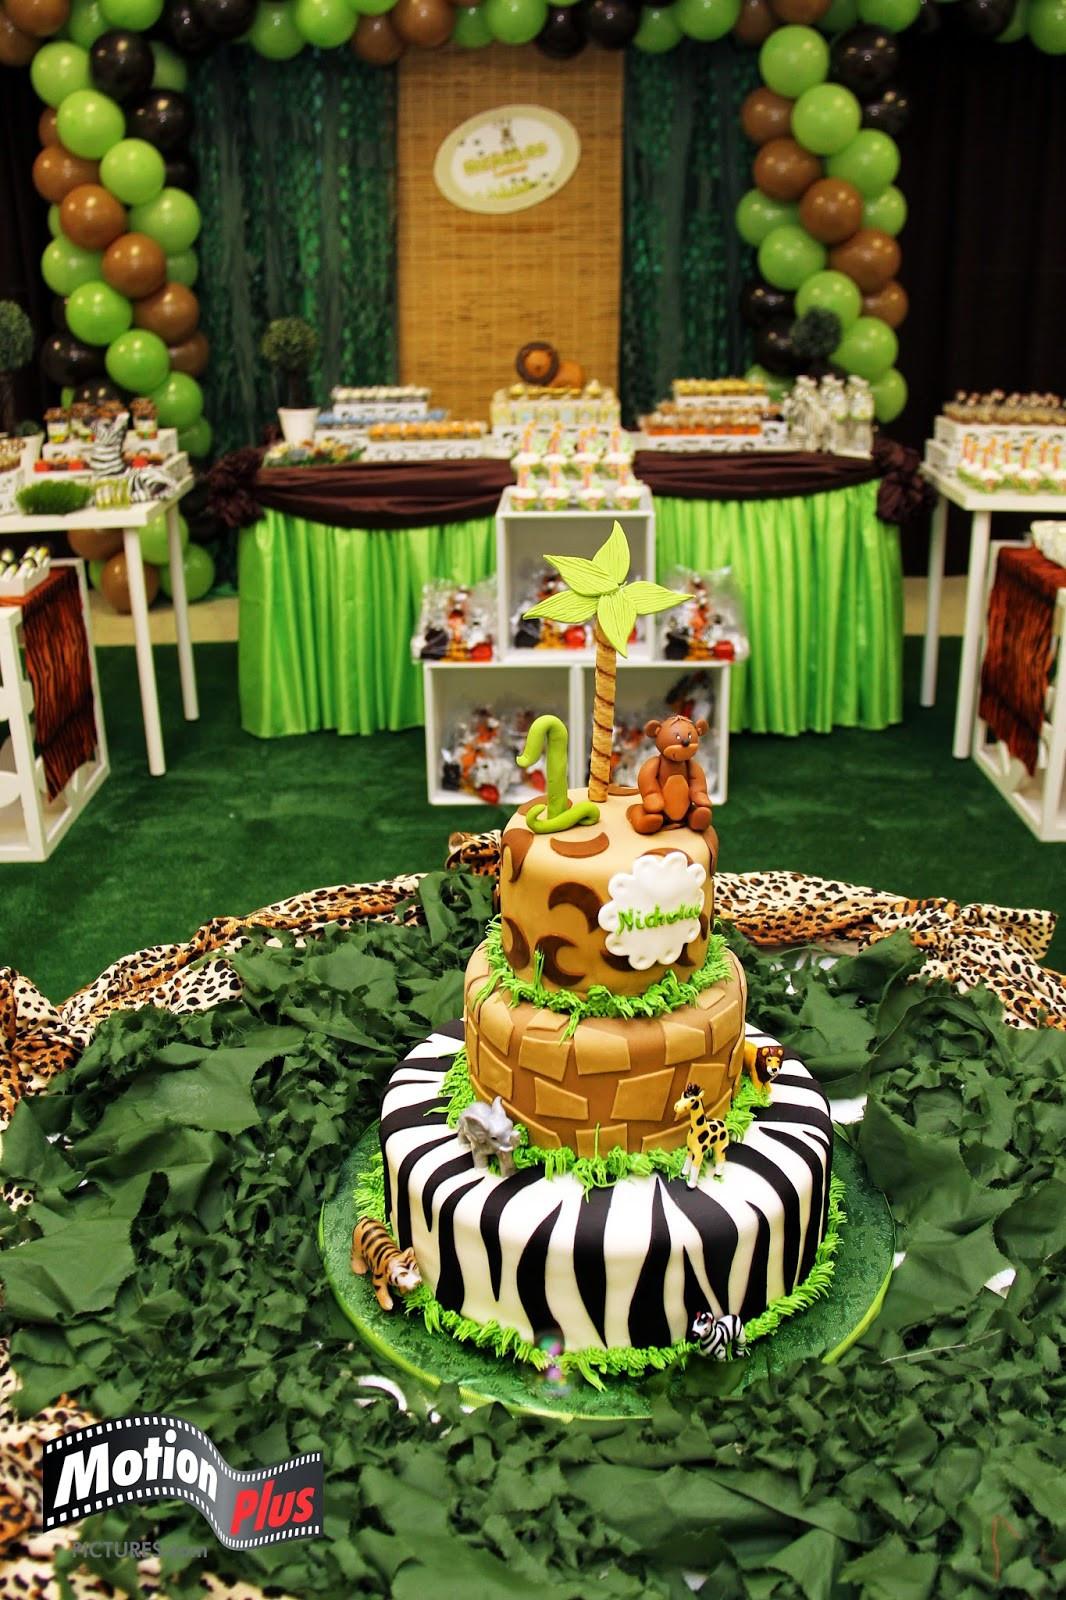 Jungle Theme Birthday Party  Motion Plus Safari Themed Birthday Party Ideas